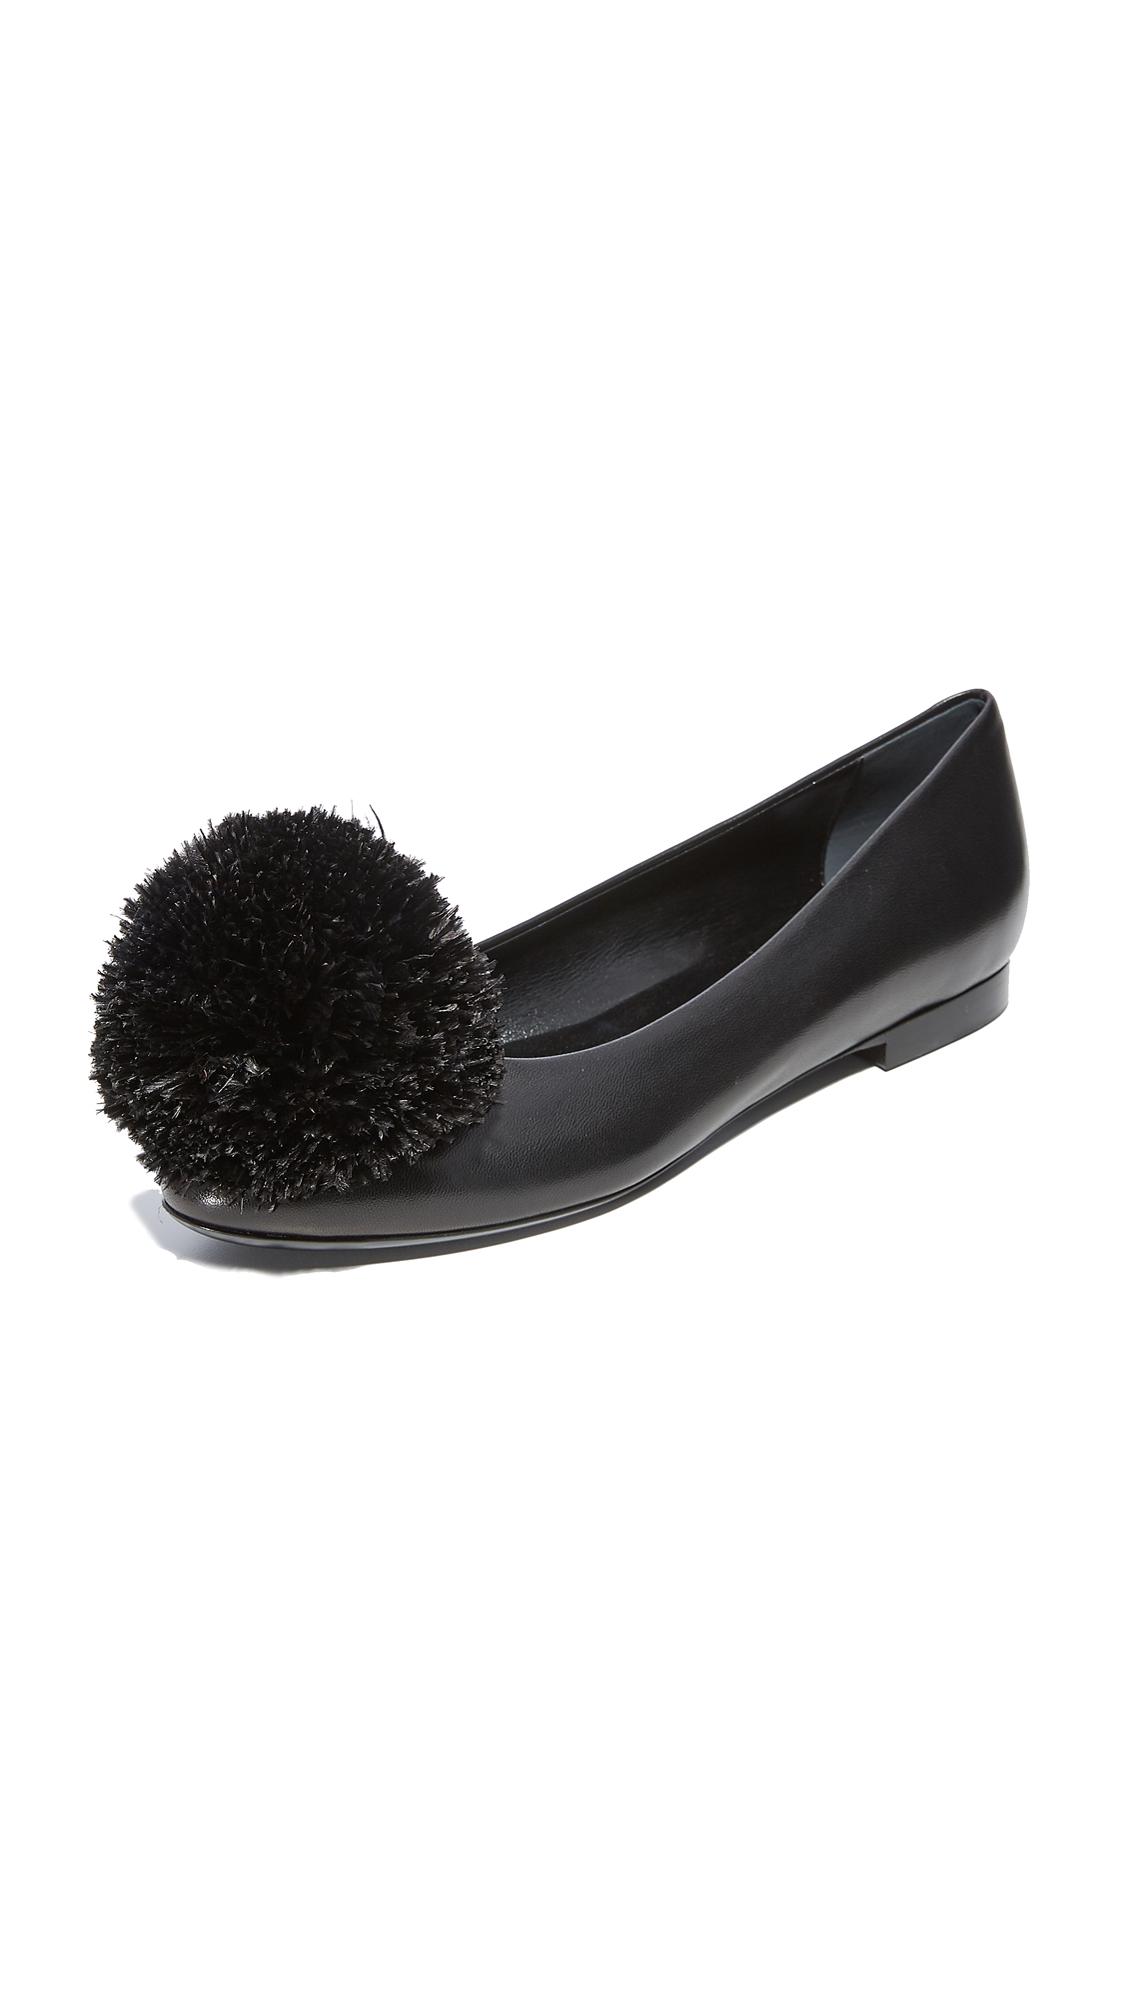 Eugenia Kim Lilou Pom Pom Flats - Black